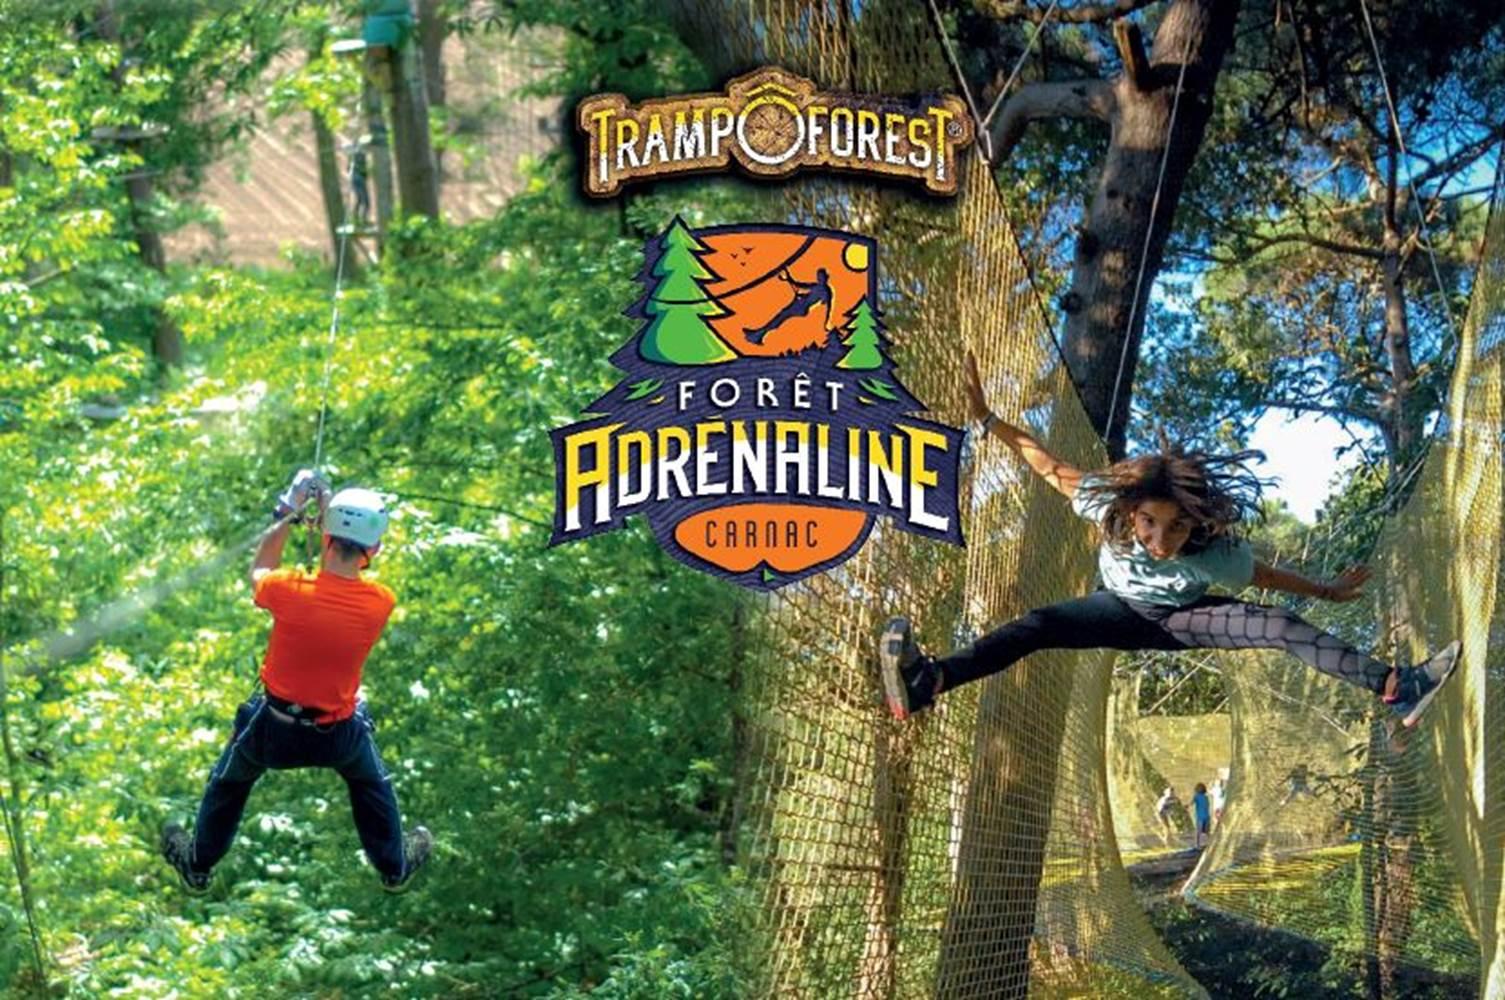 Parc Aventure FORET ADRENALINE - Carnac ©